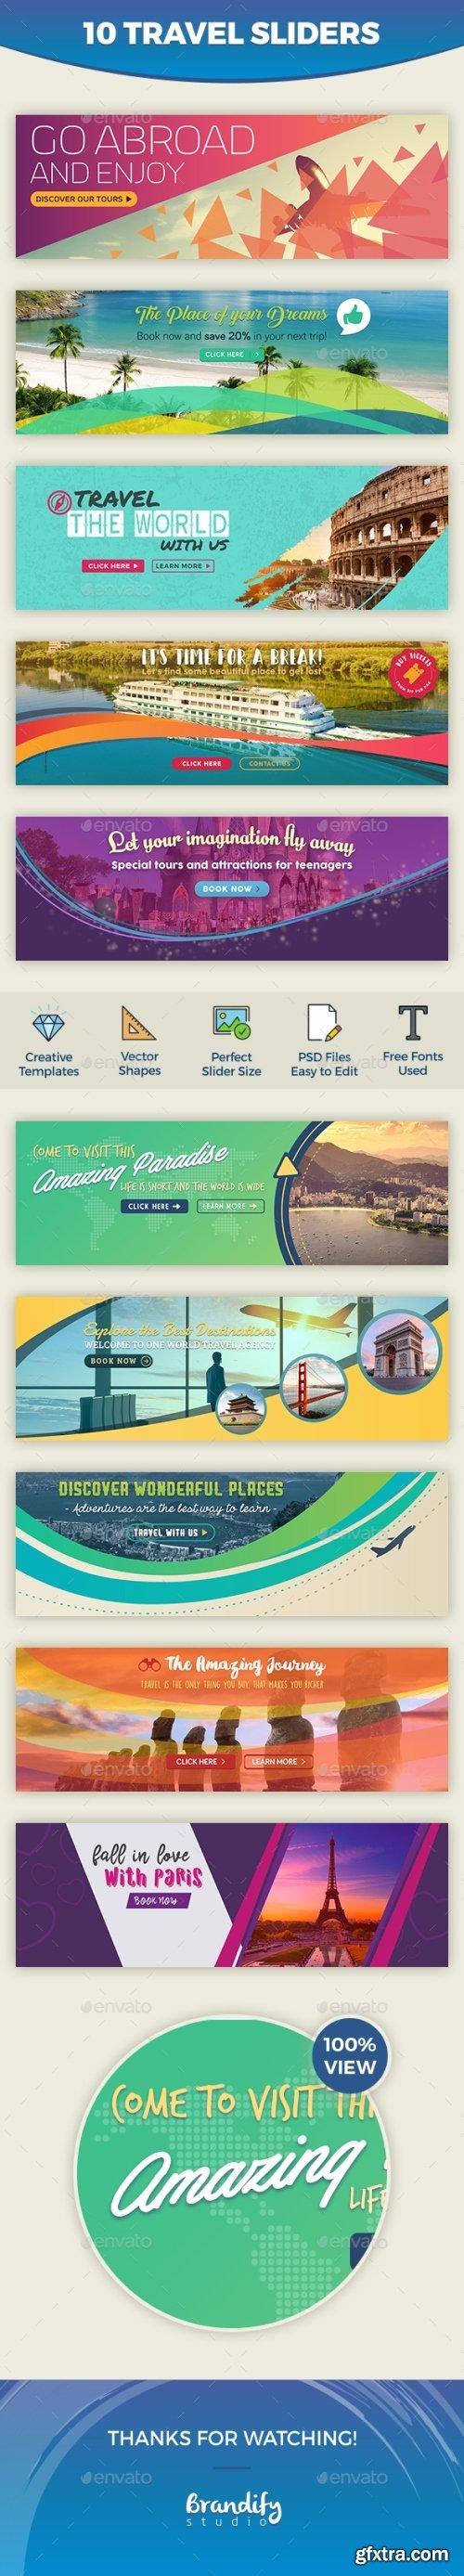 Graphicriver - Travel Slider 16700081